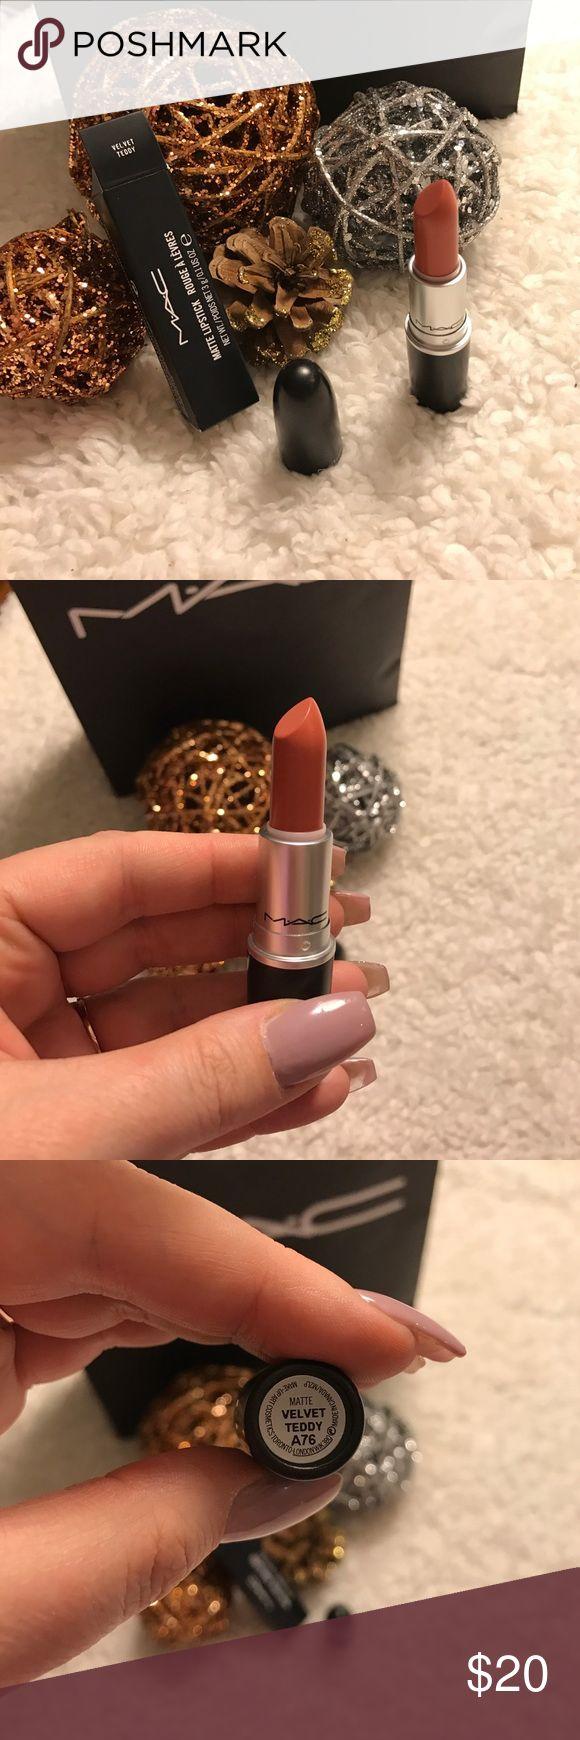 Mac Velvet Teddy Matte Lipstick! 💄💄💄 Brand new Mac Velvet Teddy Matte Lipstick!! 💄 This is one of Mac's best sellers!! Free gifts with purchase!! 🎉🎉🎉 MAC Cosmetics Makeup Lipstick